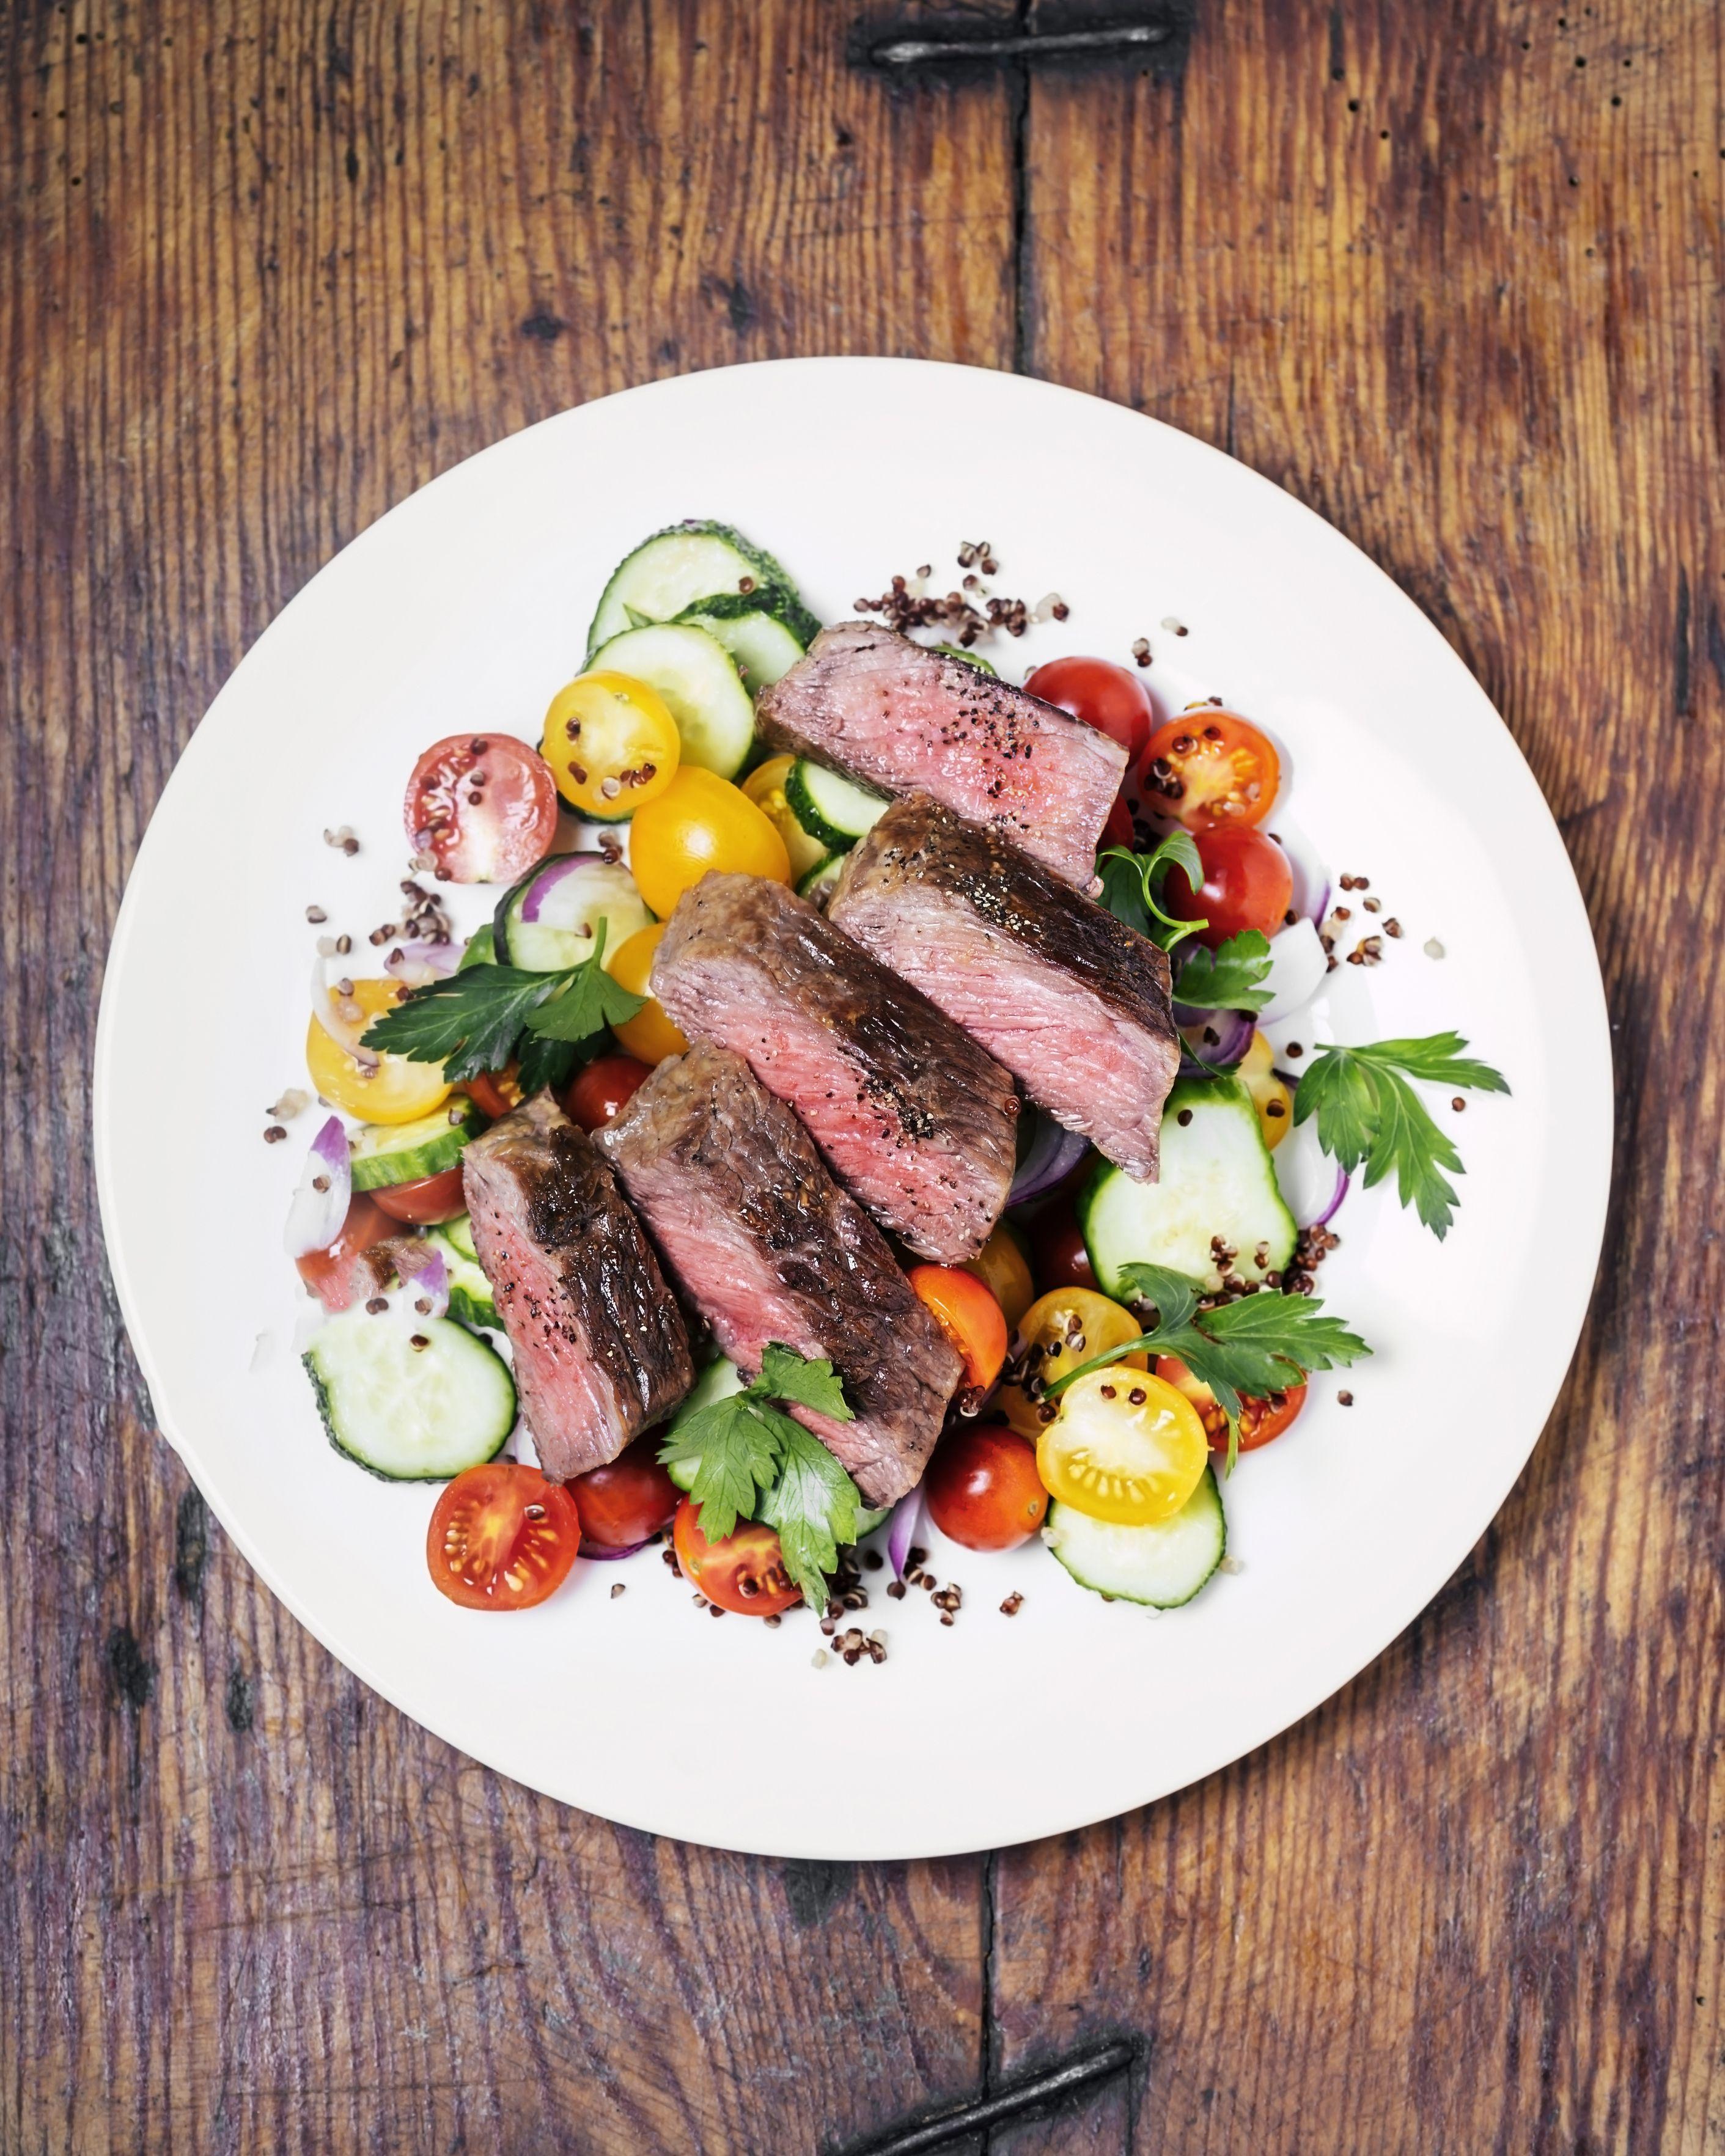 Diferencia entre dieta paleo y cetogenica